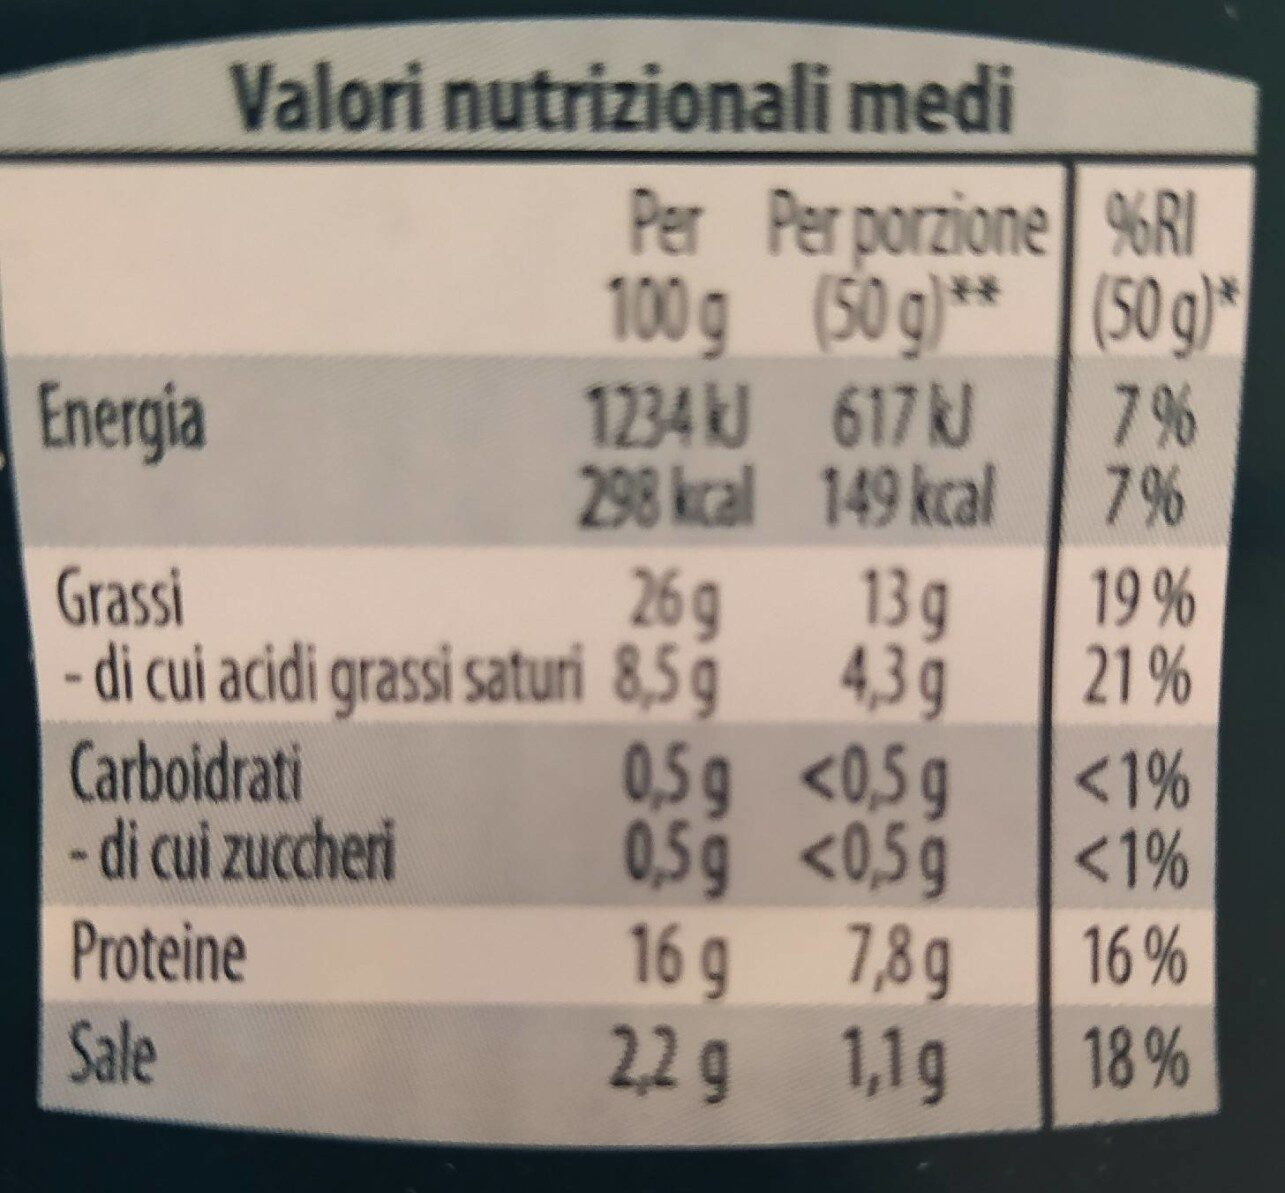 Mortadella Bologna IGP - Nutrition facts - it